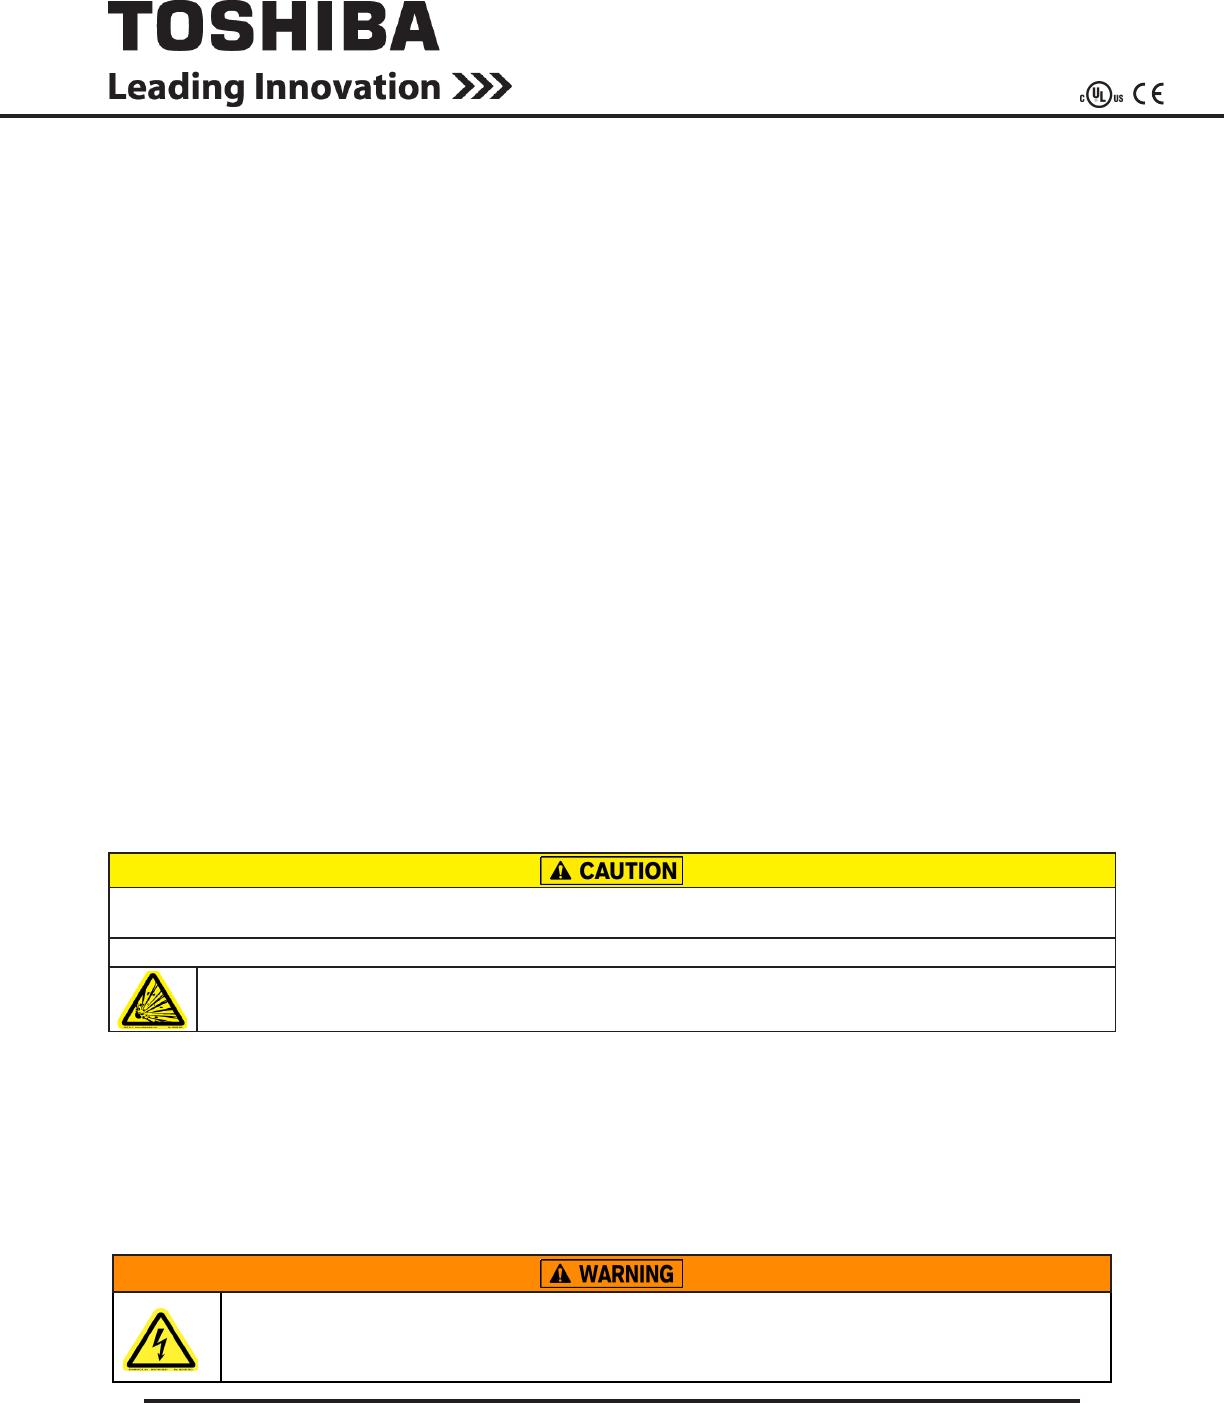 Toshiba 1600 Xp Ups Users Manual Wiring Diagram